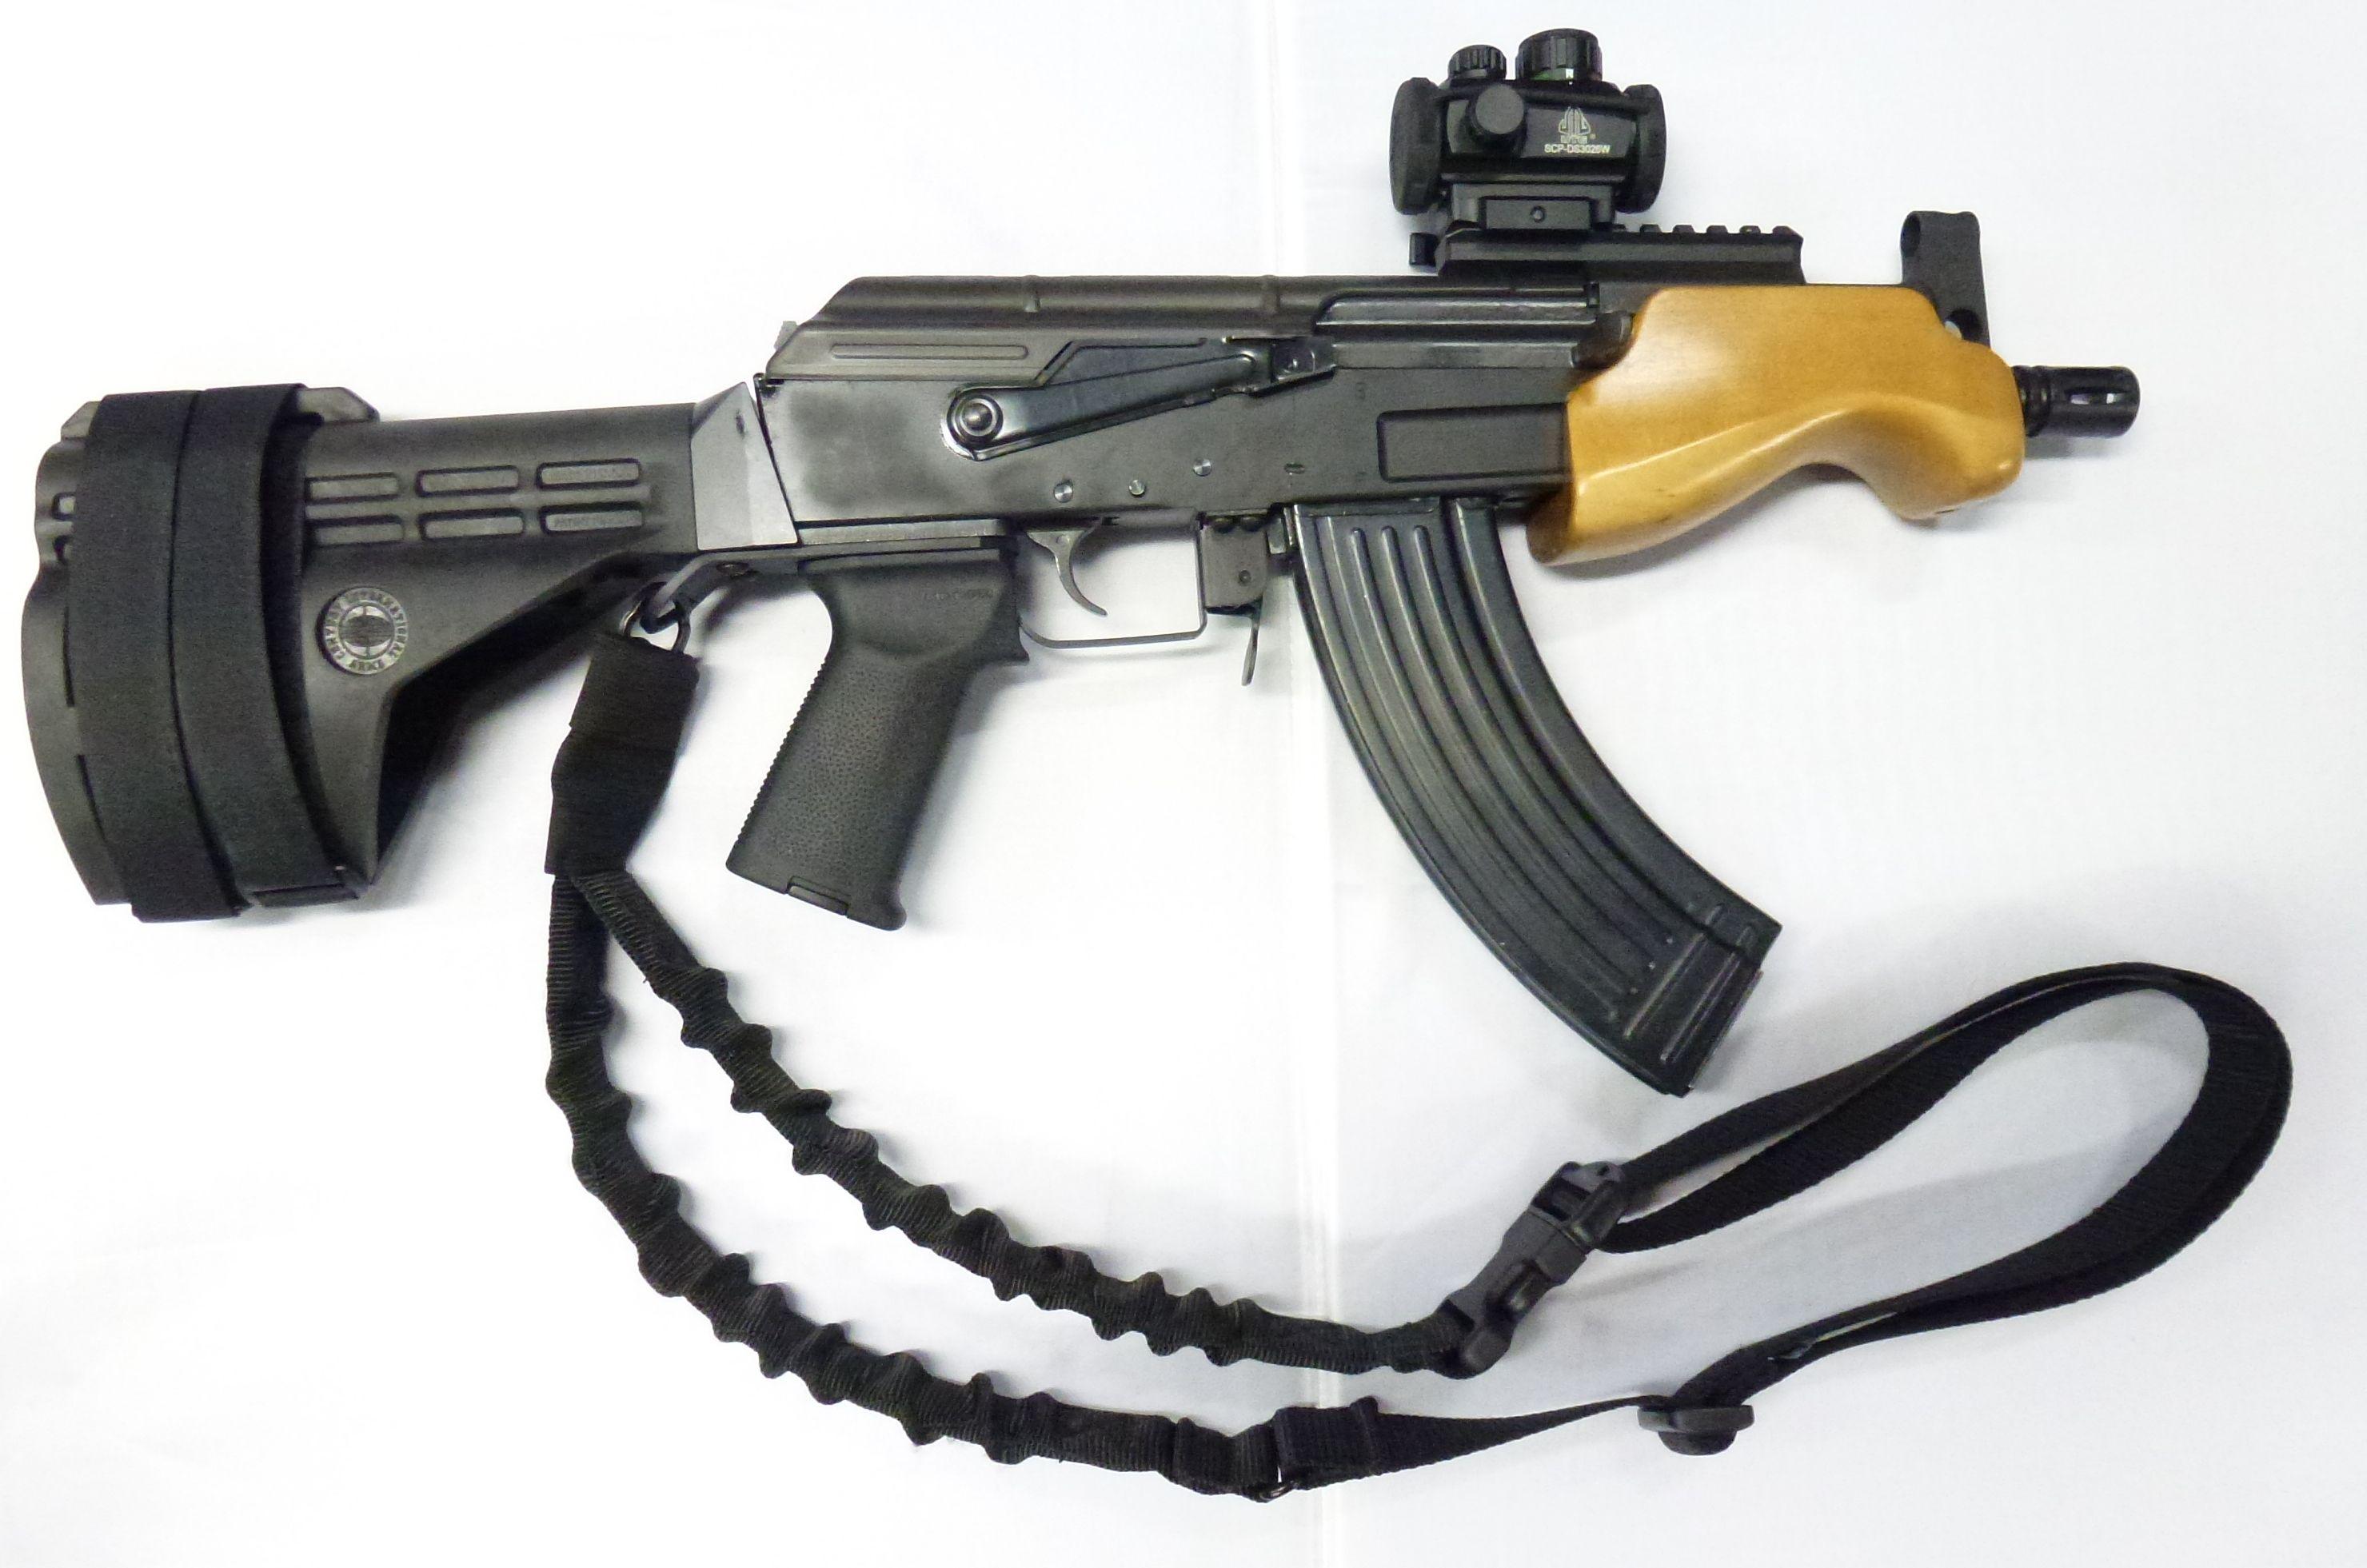 SOB47 Arm BraceFits all AK Pistol Variants | Hand Guns | Ak pistol